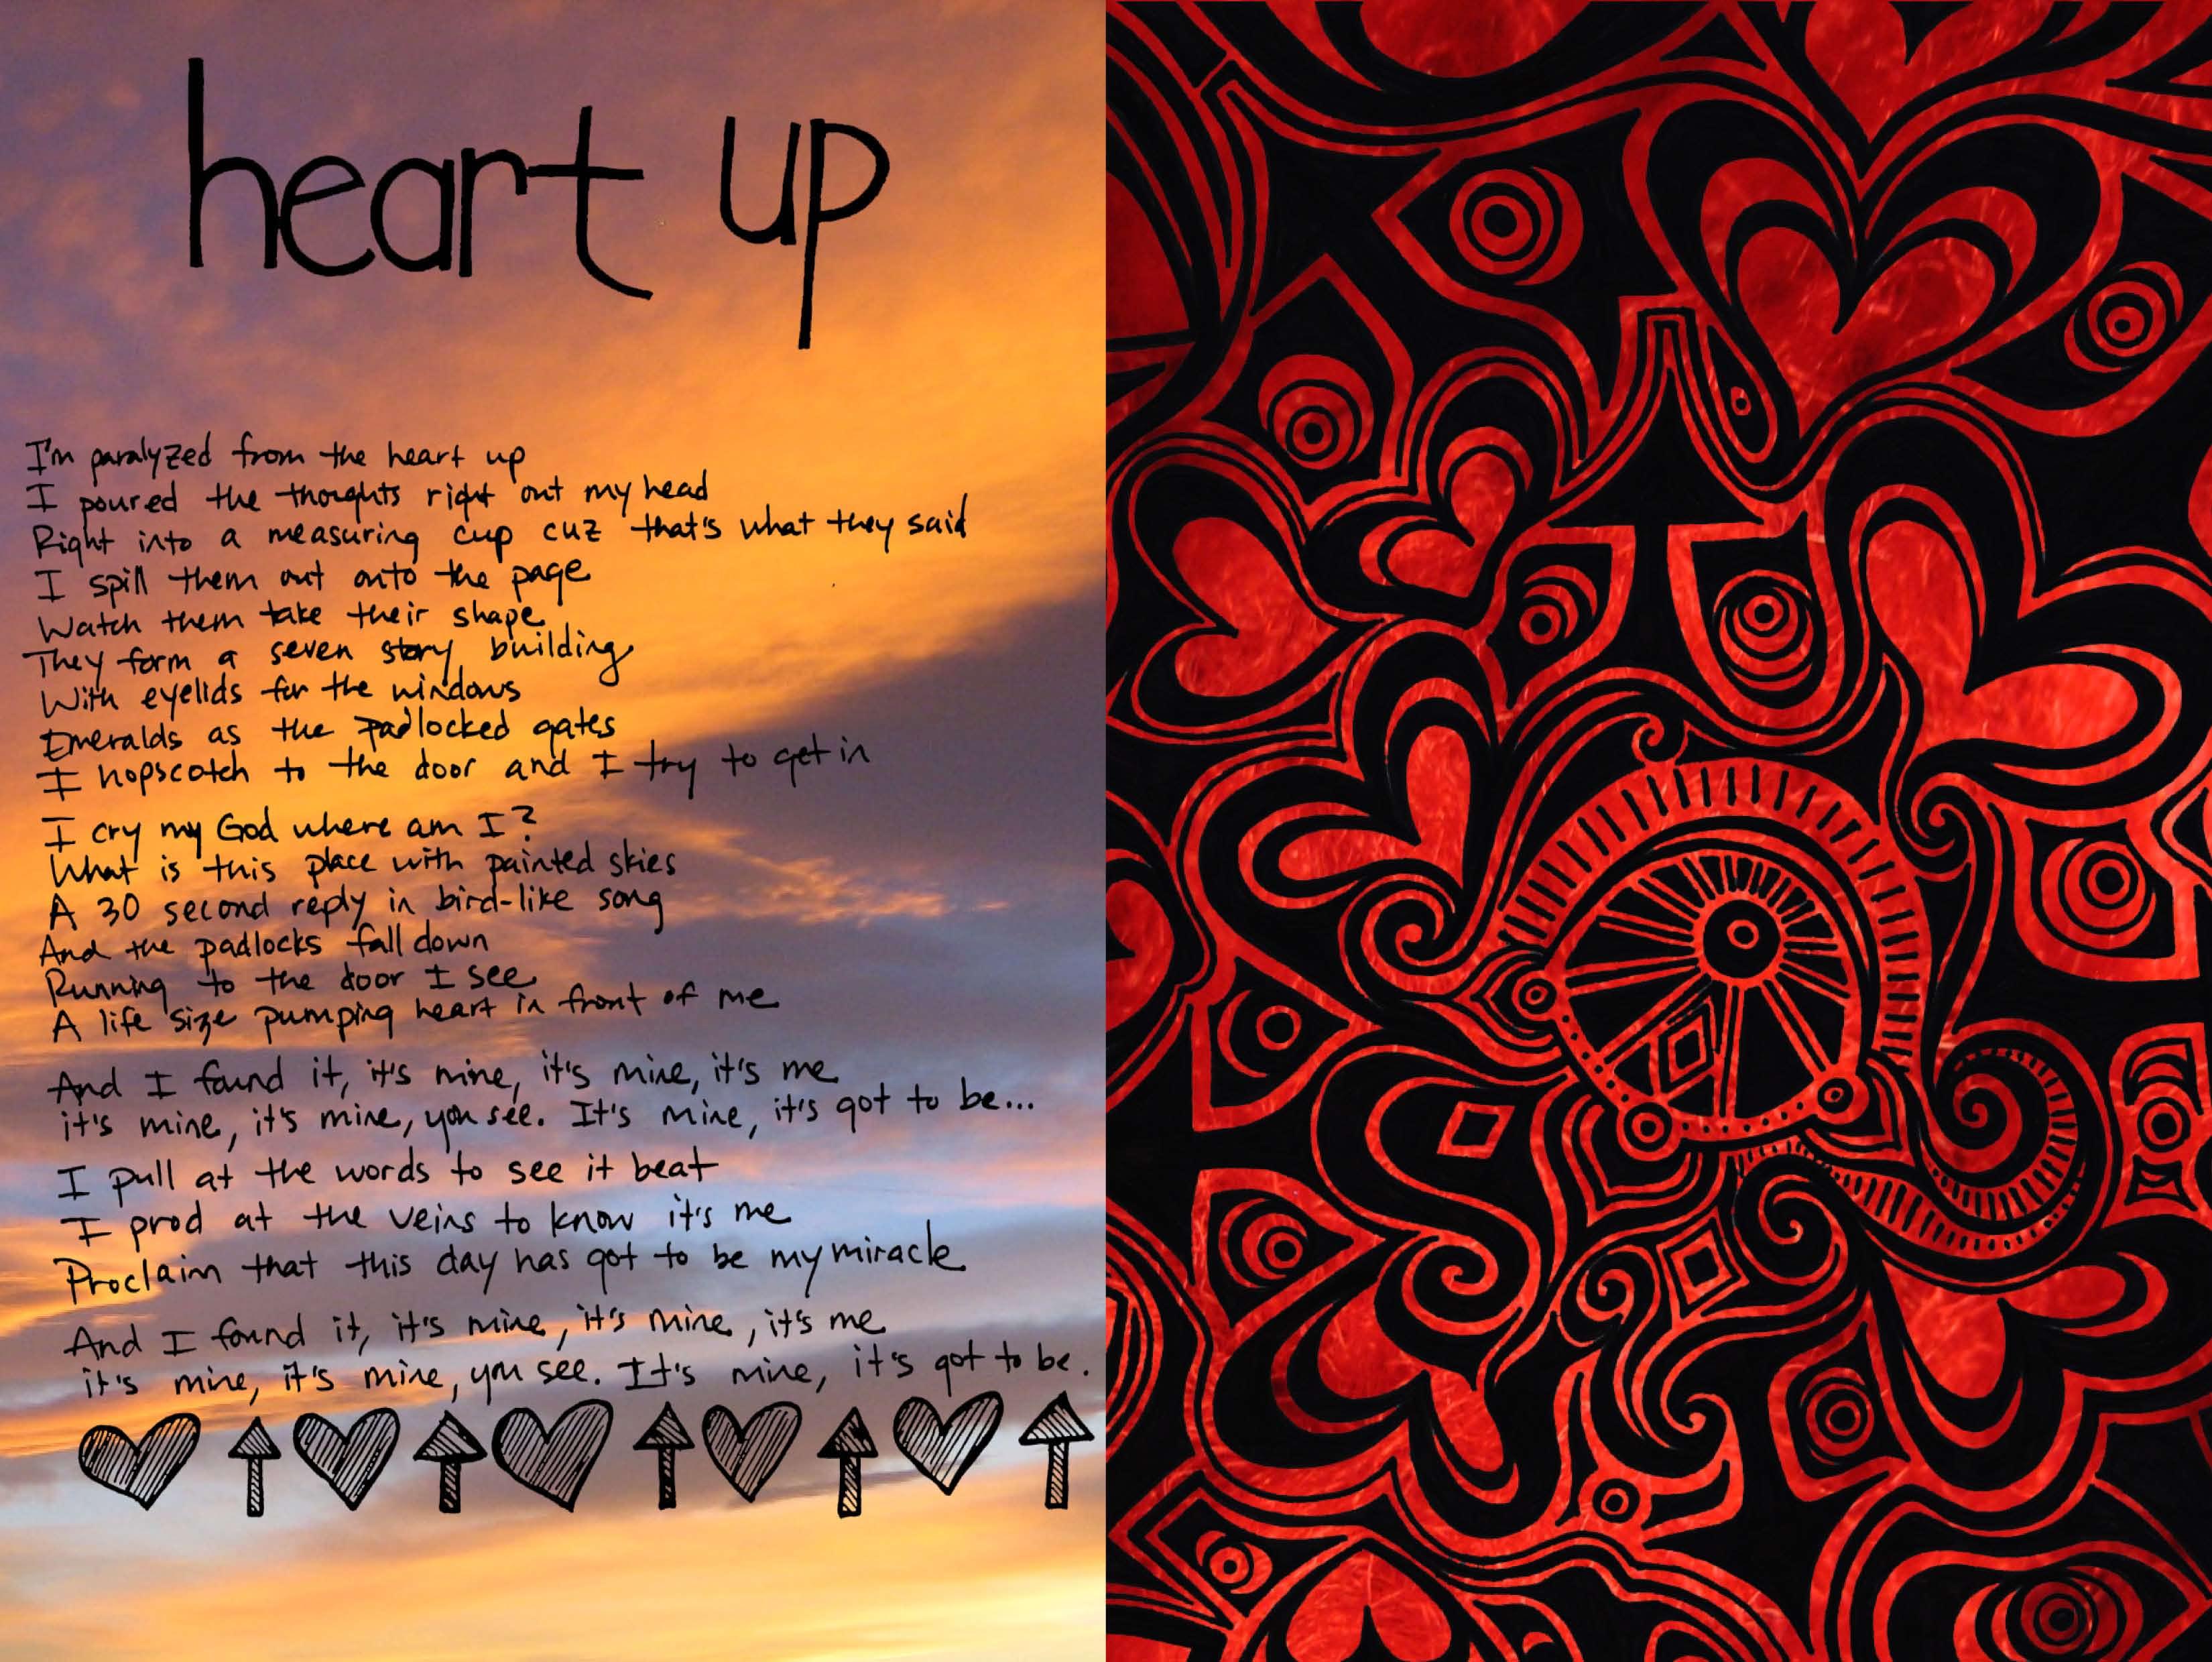 The Common Loon - Flight (Music Album Art), by Billy Reiter & Tara Marolf